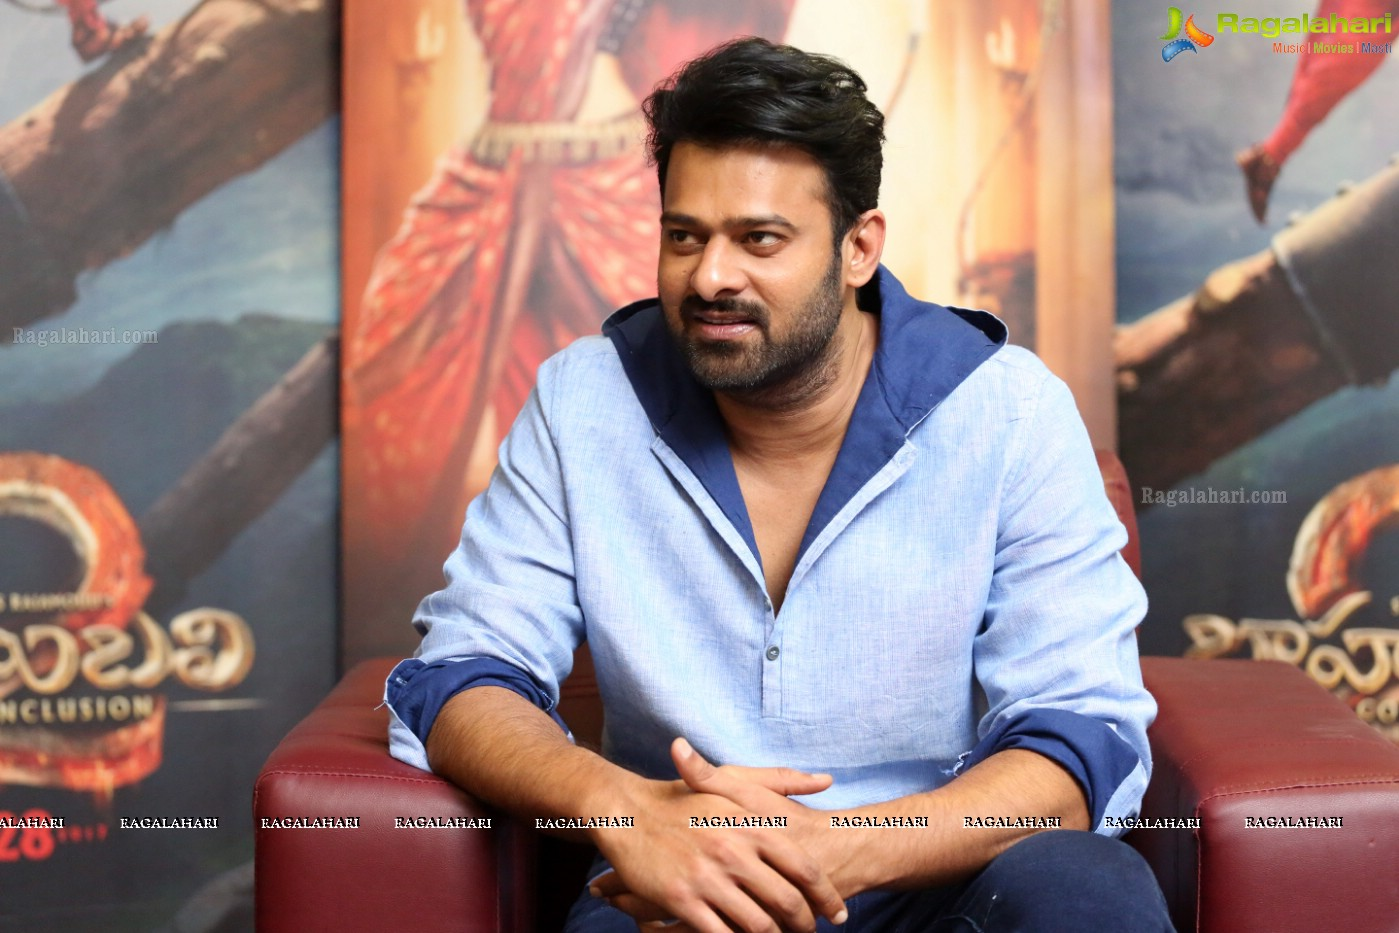 Prabhas Hd Wallpapers Download Telugu Actor Prabhas: Telugu Hero Gallery,Images